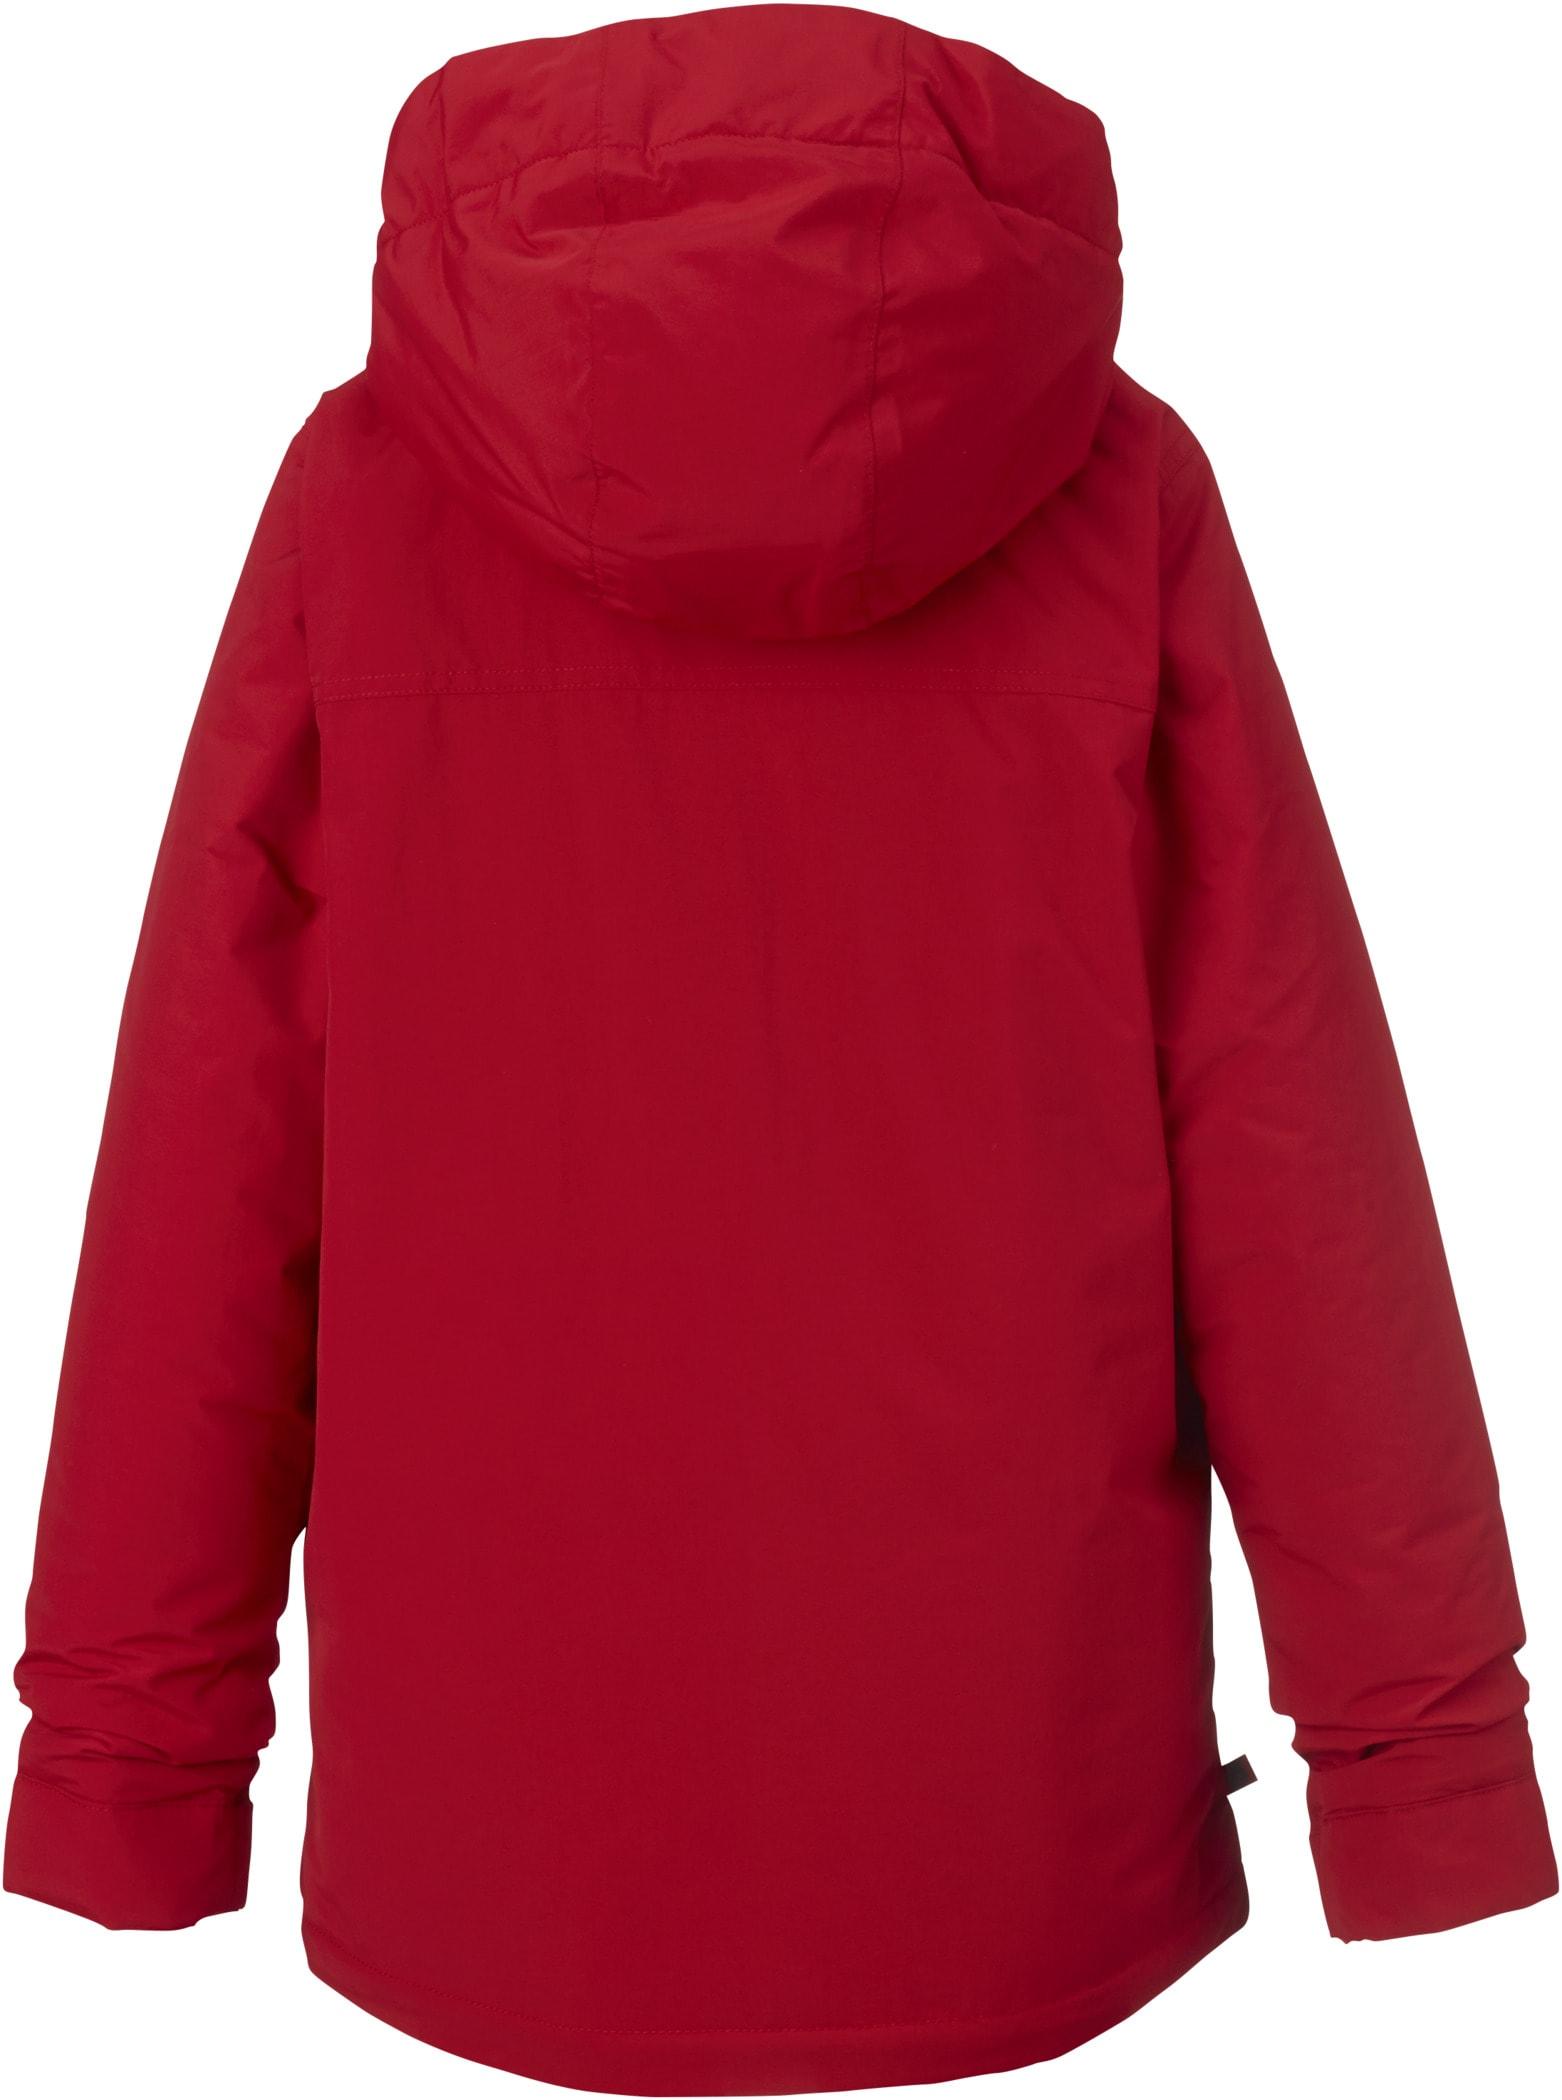 5189cbf74 Burton Amped Snowboard Jacket - Kids